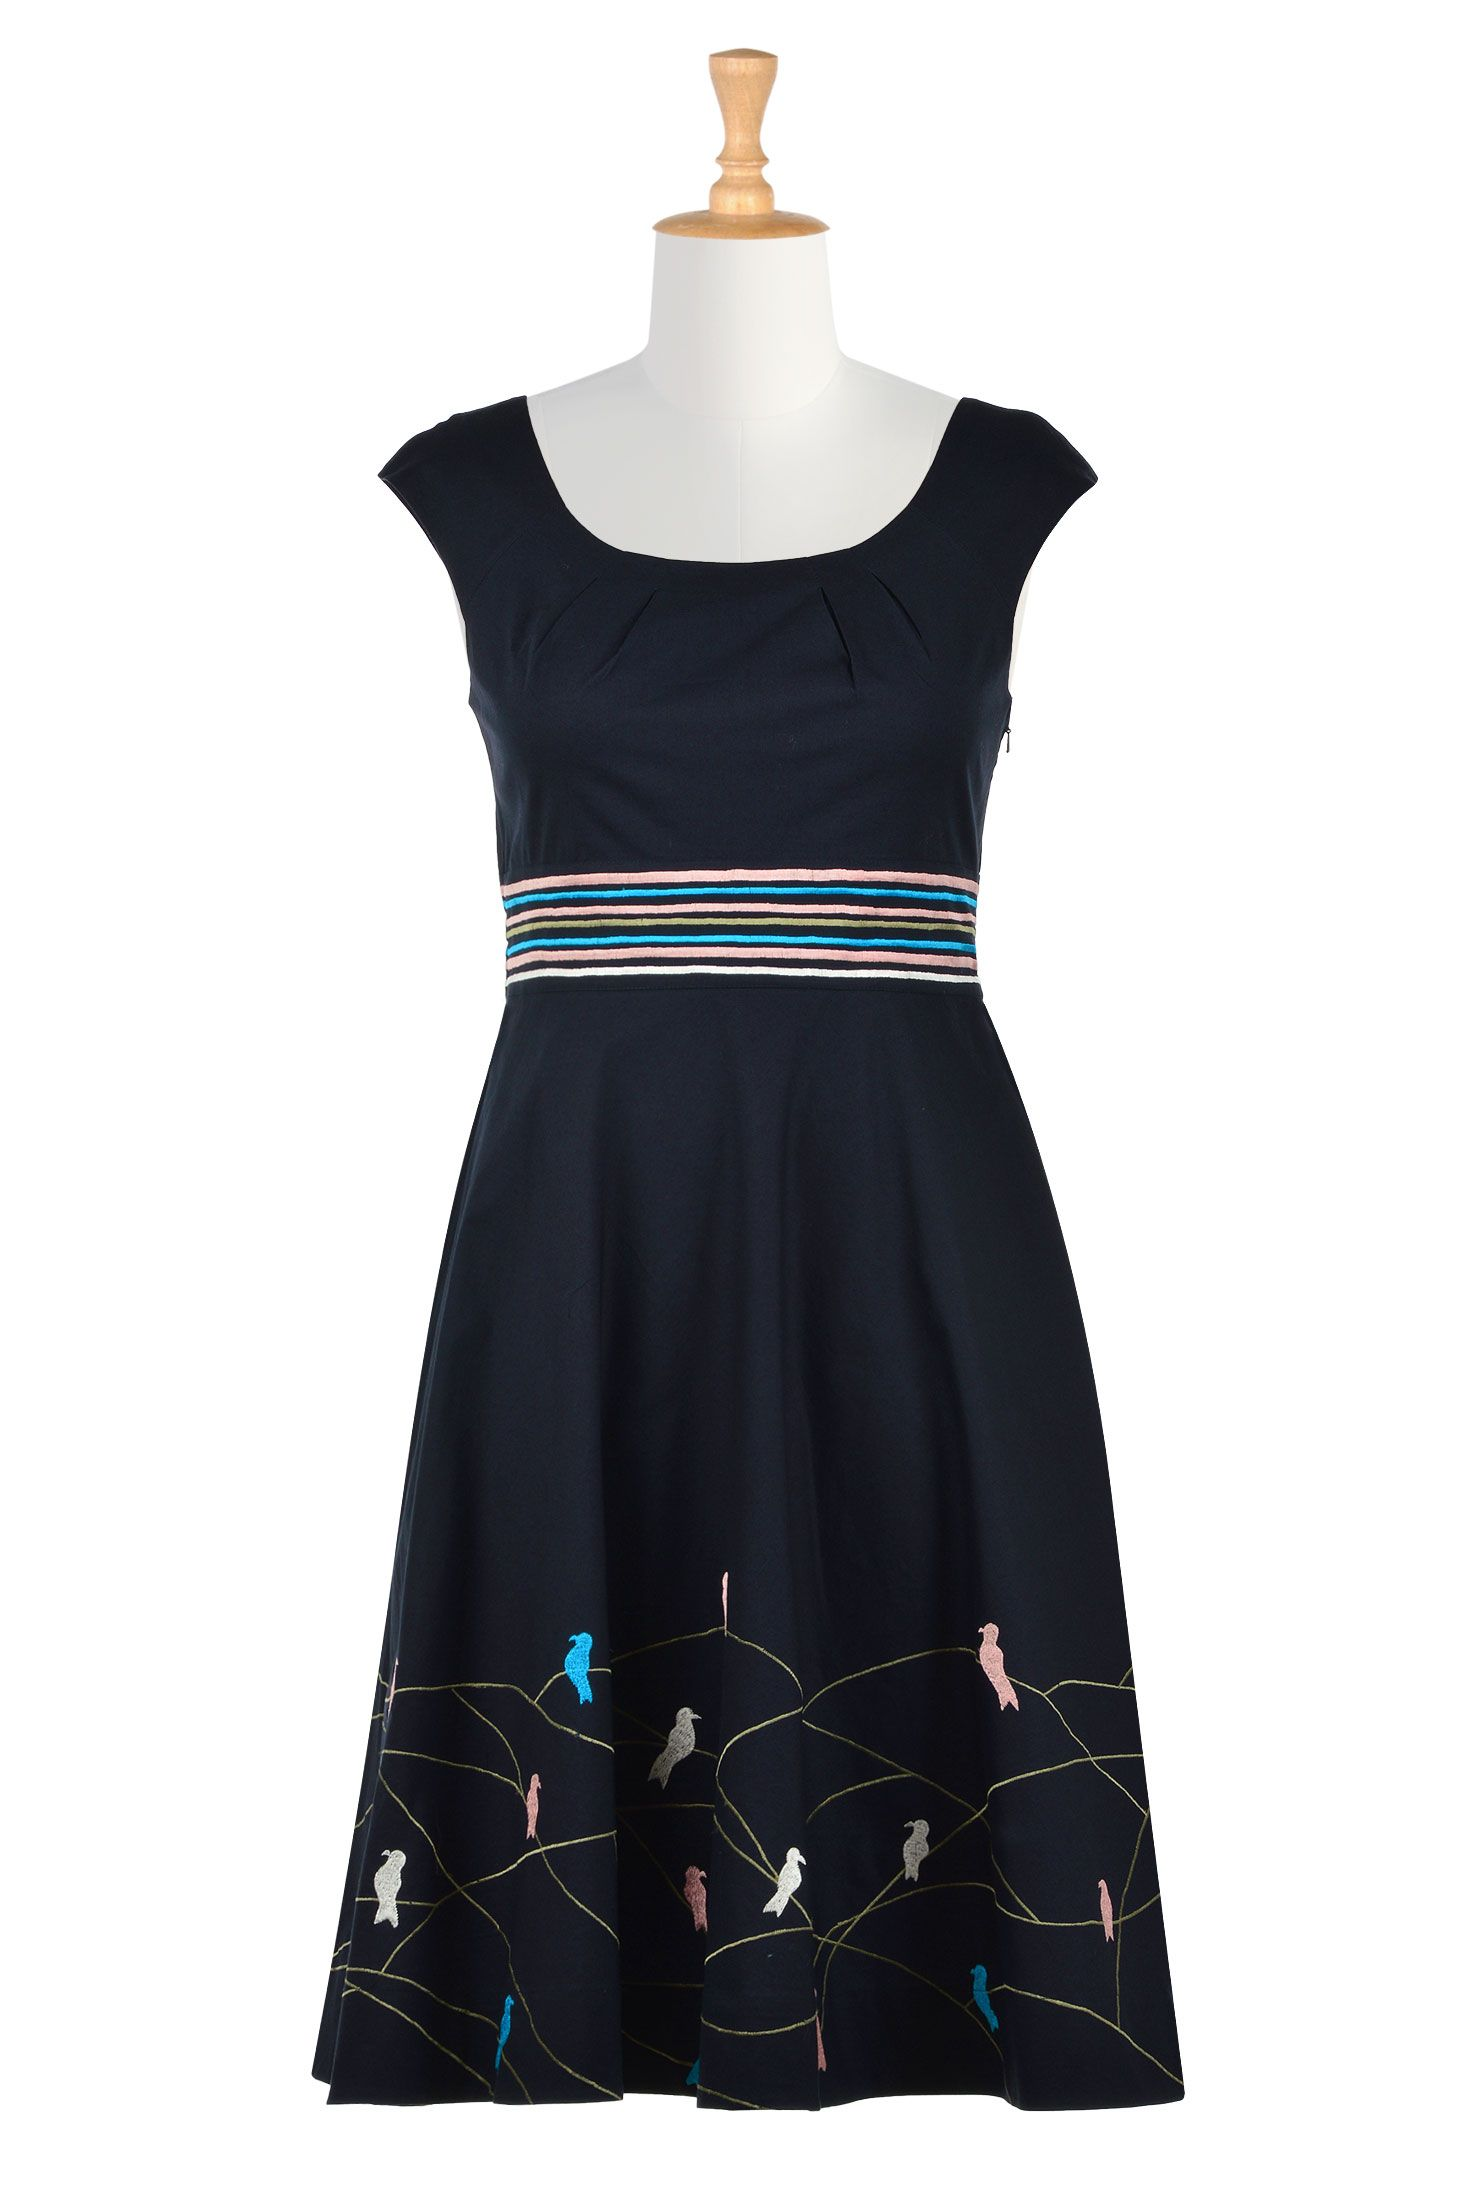 92d3f8e4634 Shop Women s designer fashion dresses